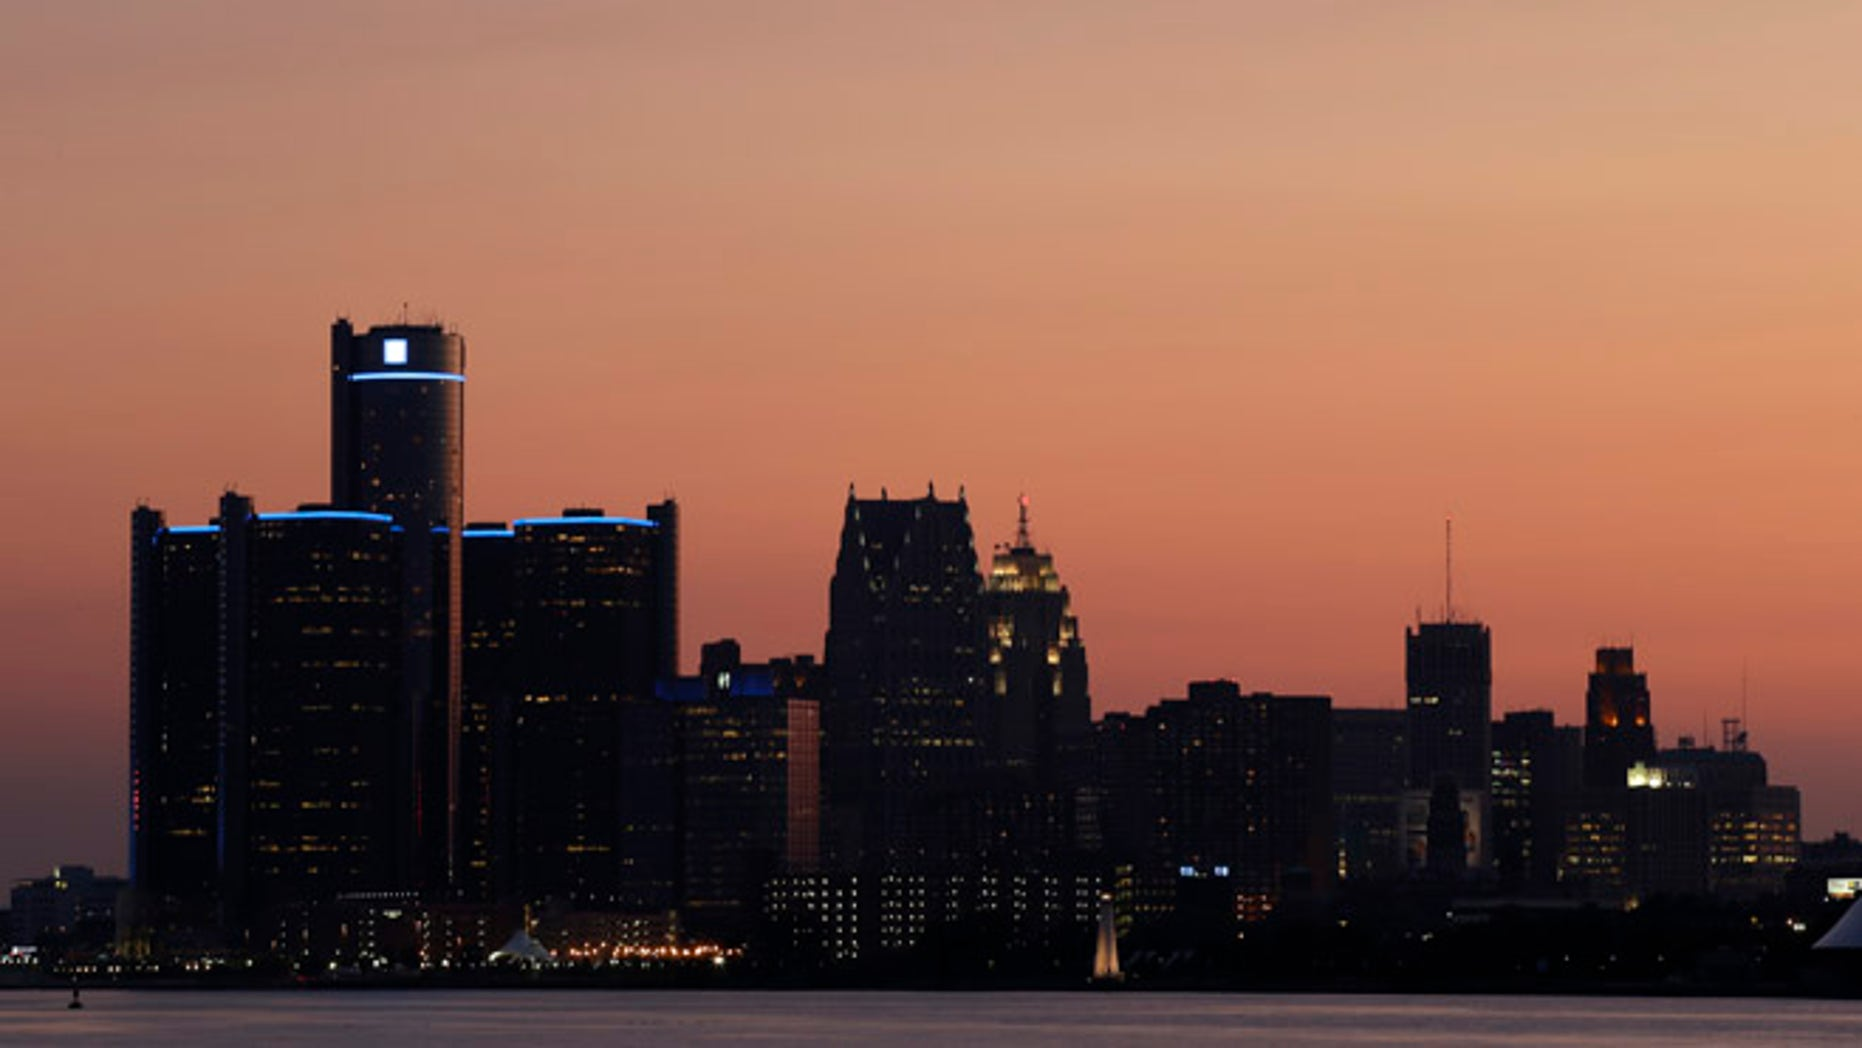 July 18, 2013: The sun sets on Detroit.